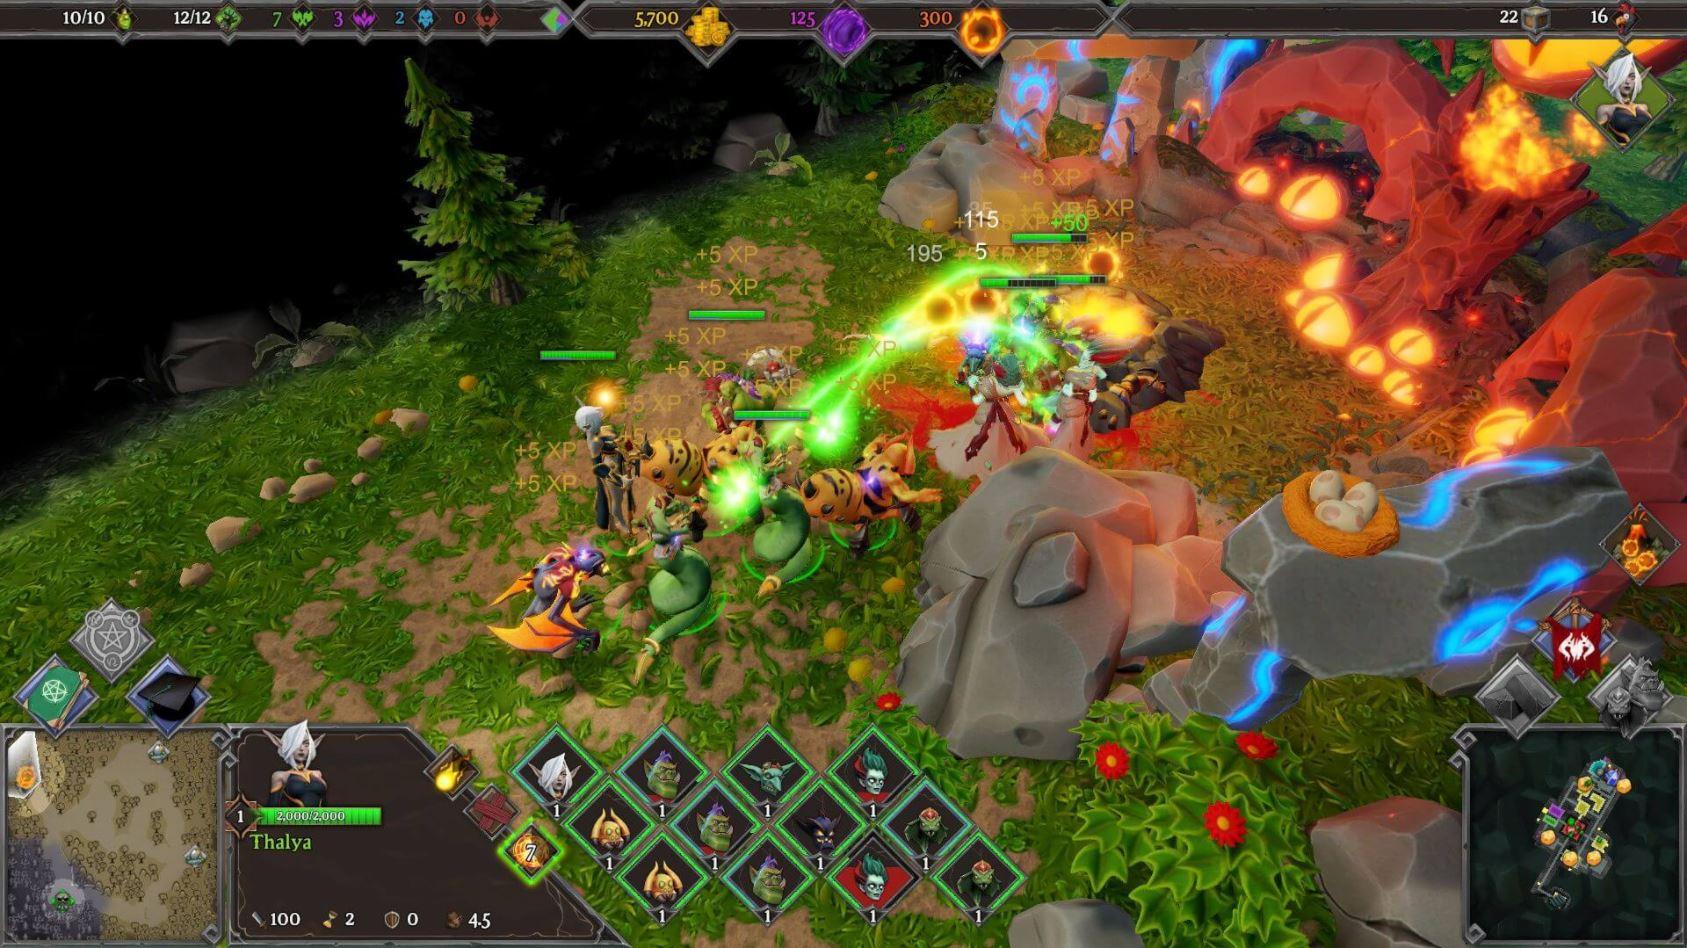 Dungeons 3 sur Steam promo dungeons 2 screen146448